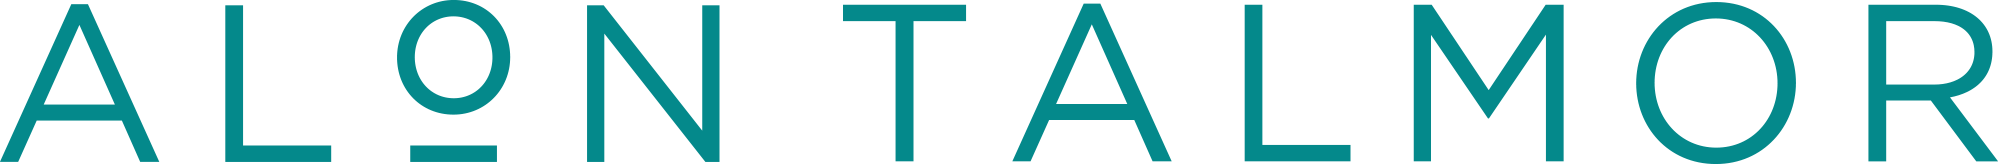 Alon-LOGO-Green-HORIZ.png